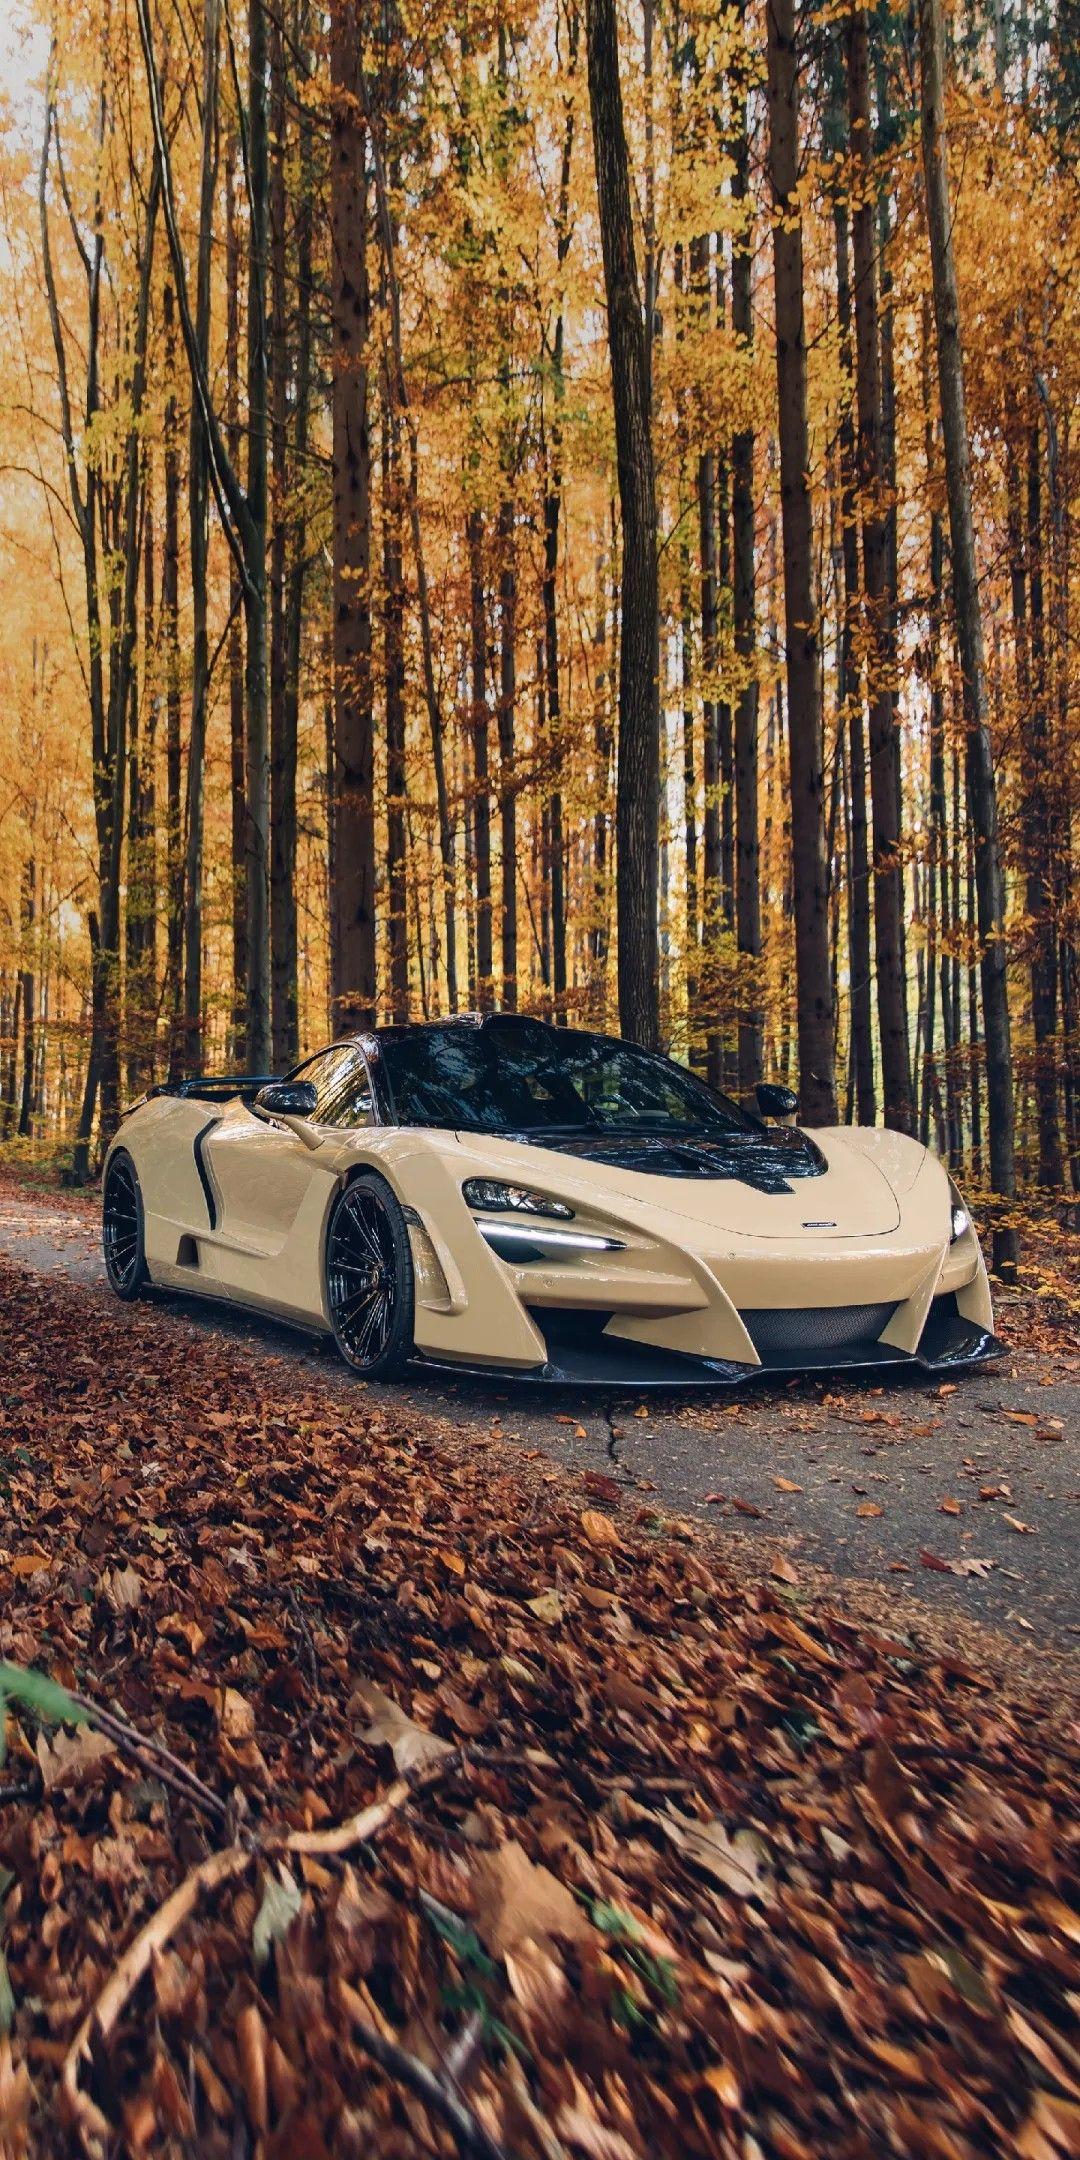 Mclaren Sportscar Cars Nature Mclaren Super Cars Supercars